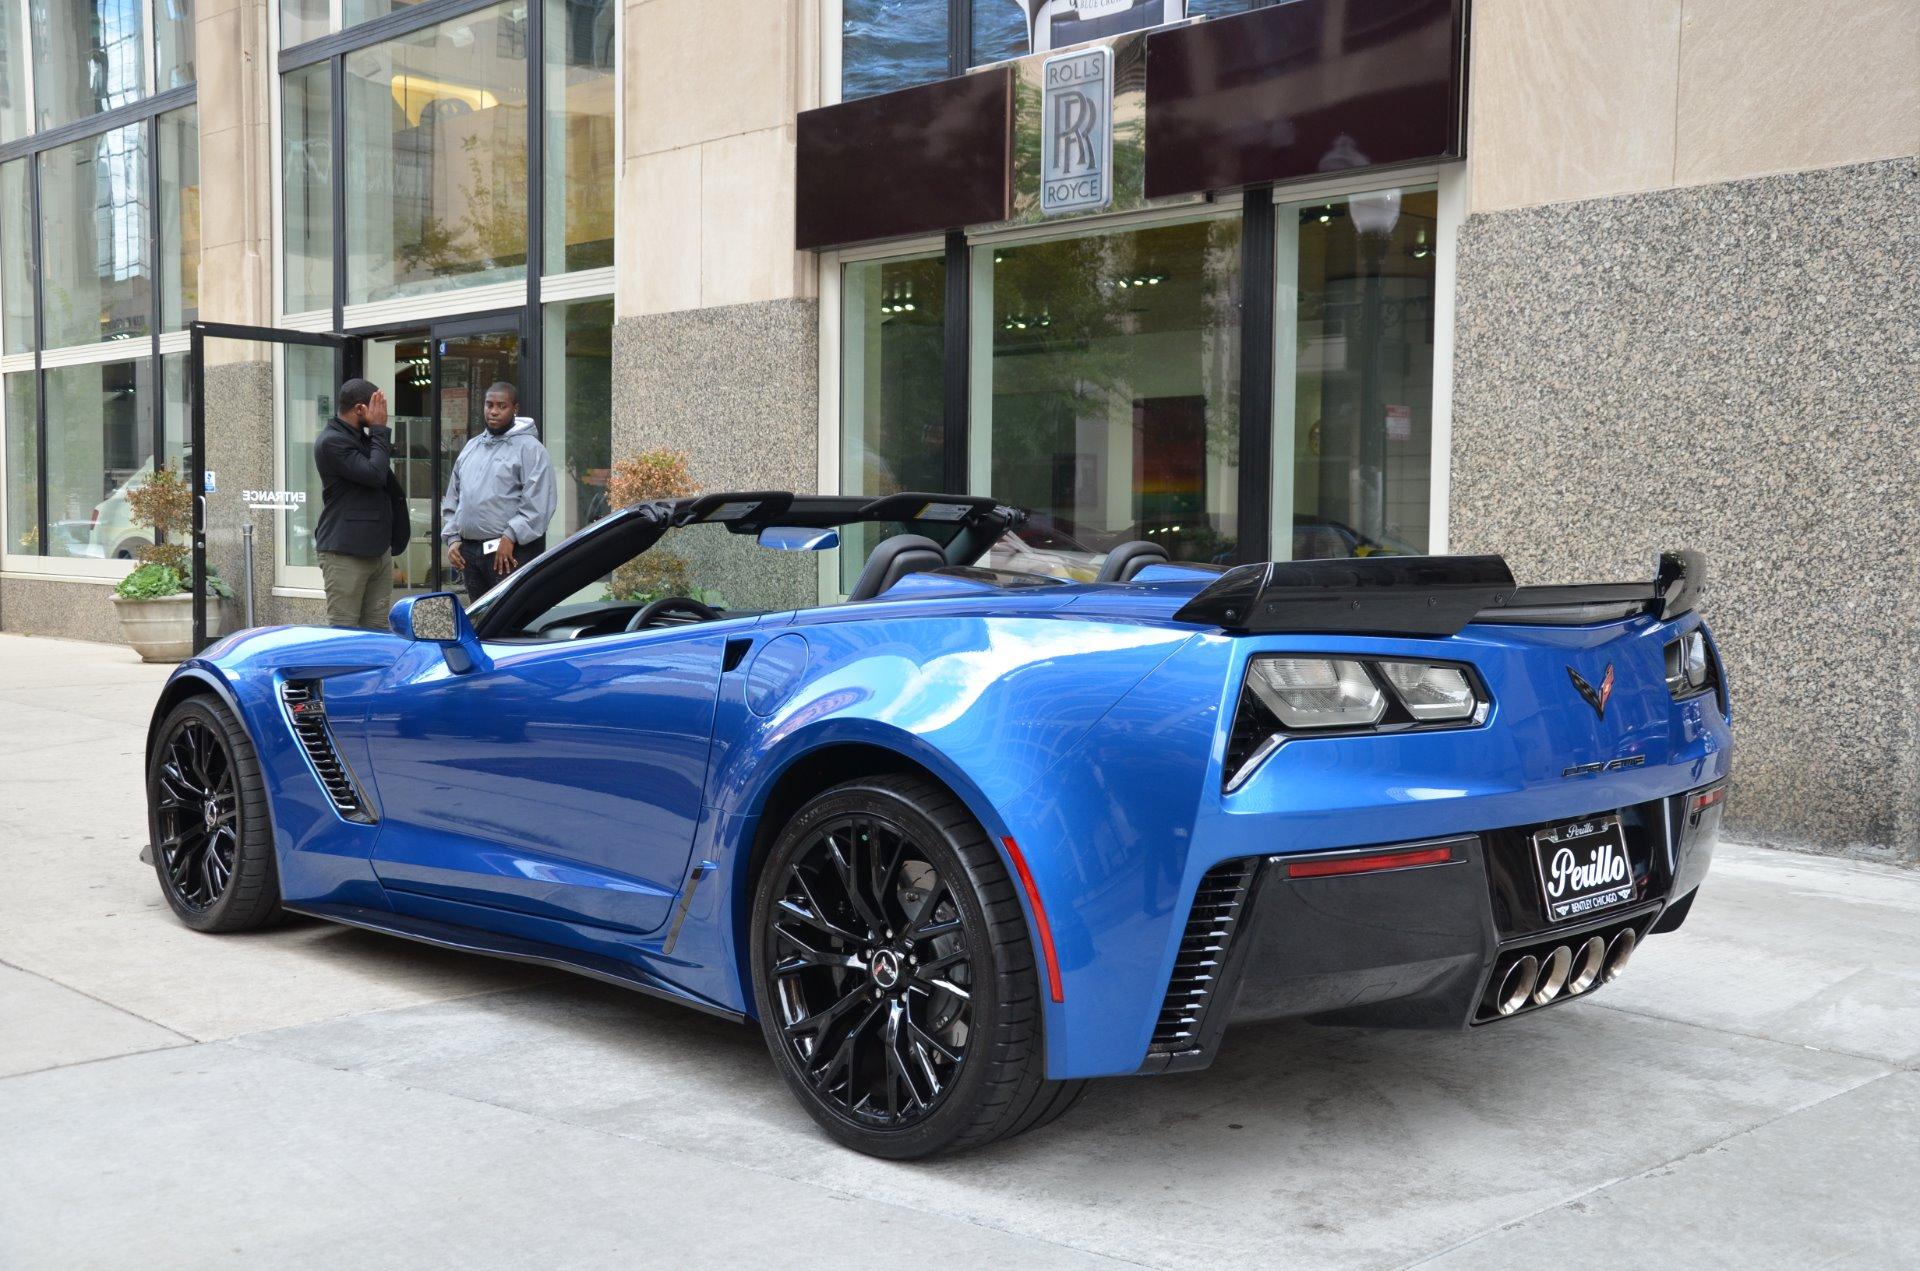 2015 chevrolet corvette z06 stock gc chris62 for sale near chicago il il chevrolet dealer. Black Bedroom Furniture Sets. Home Design Ideas